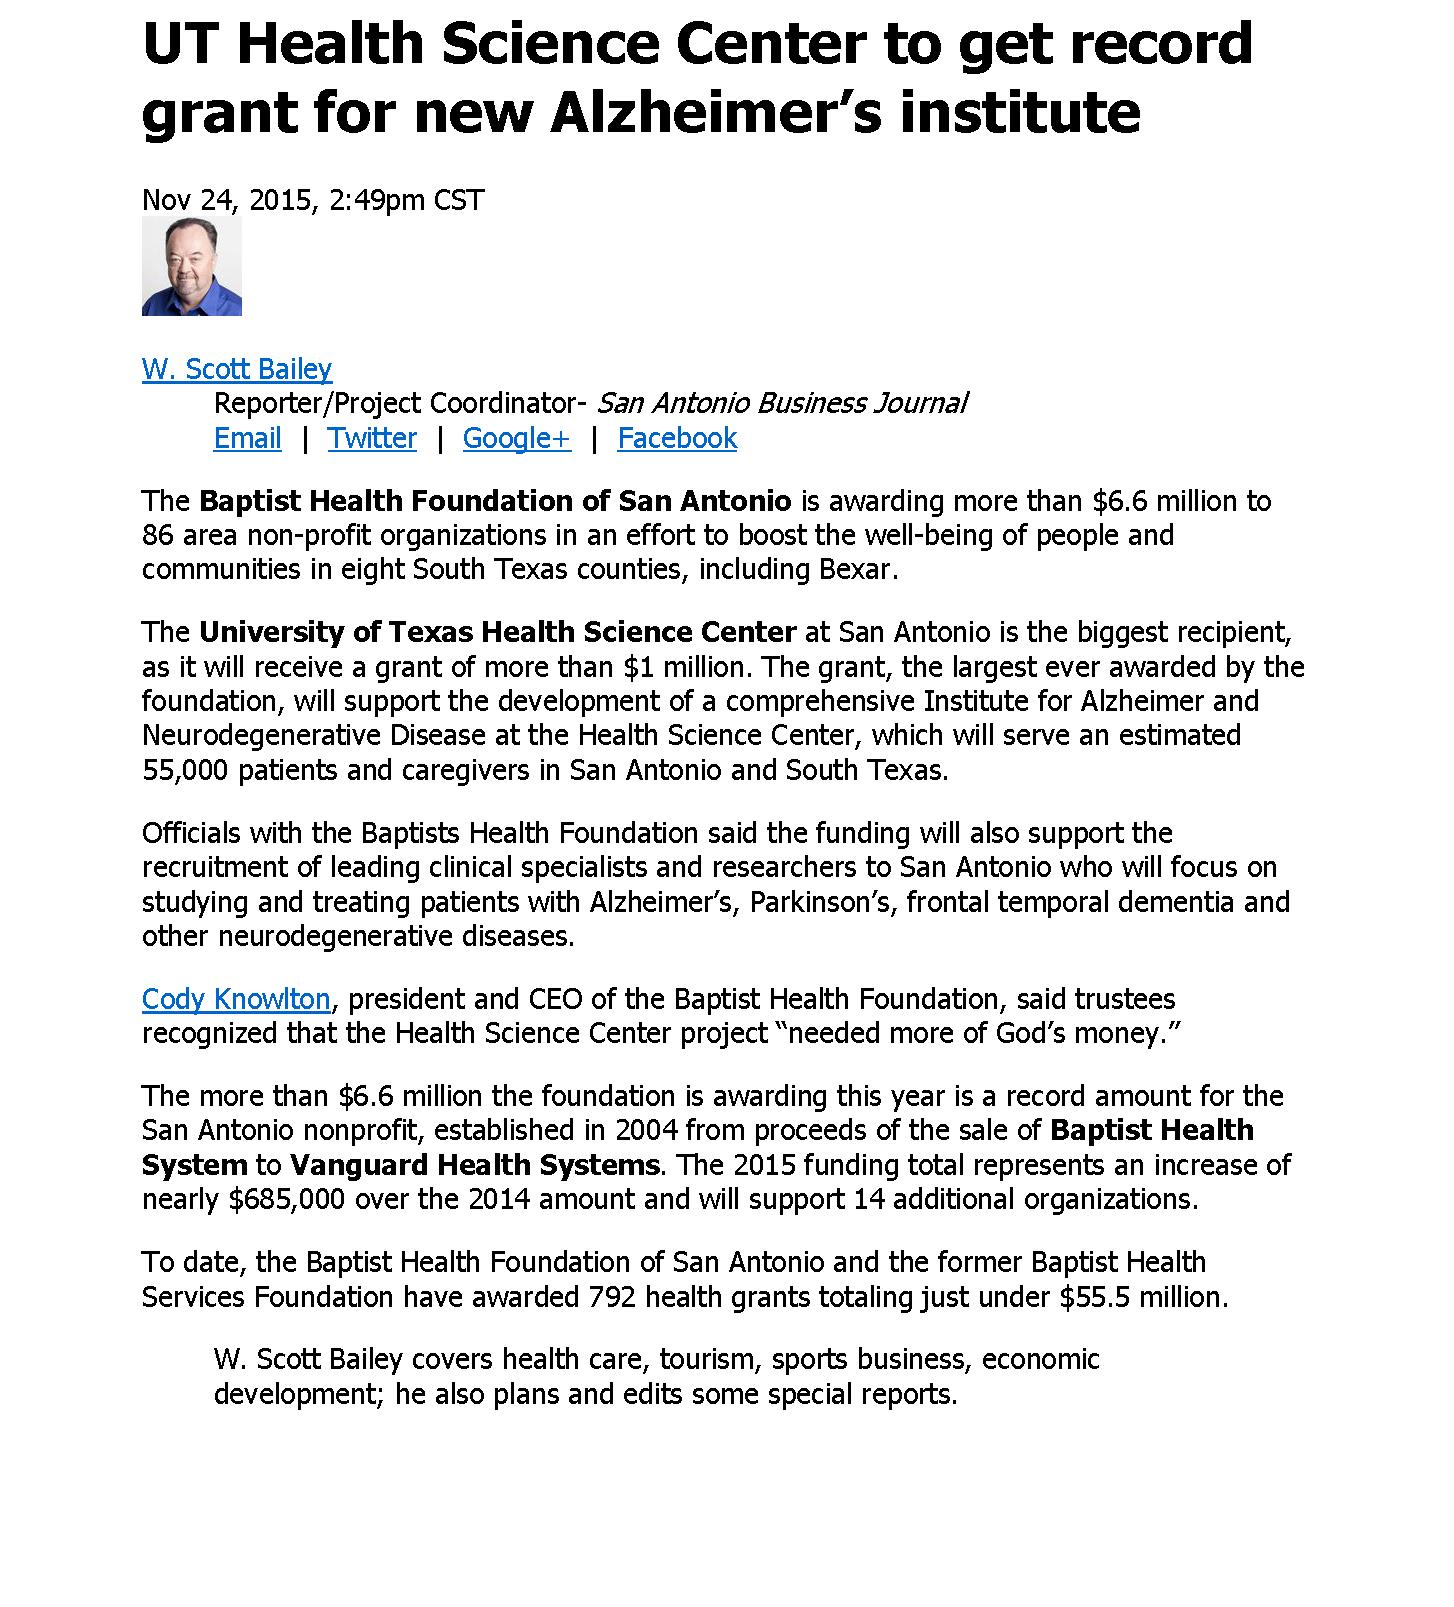 SABJ-UTHSCSA Alzheimers Institute